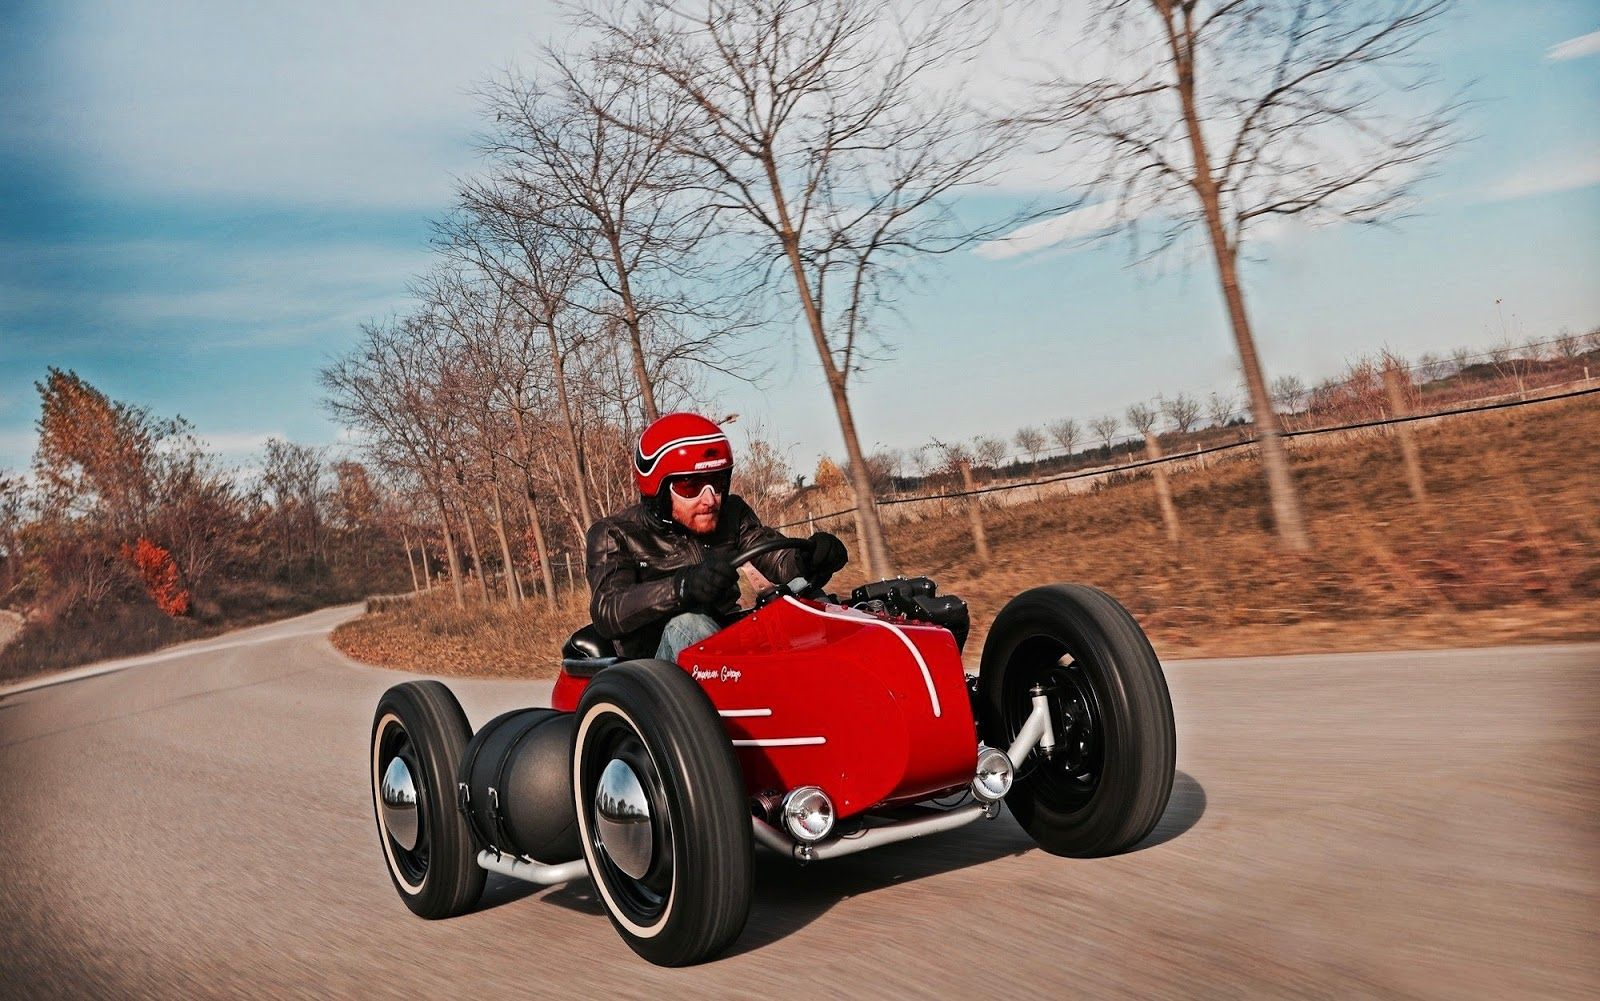 Oil stain garage: Harley Davidson Sidecar 4-wheeler